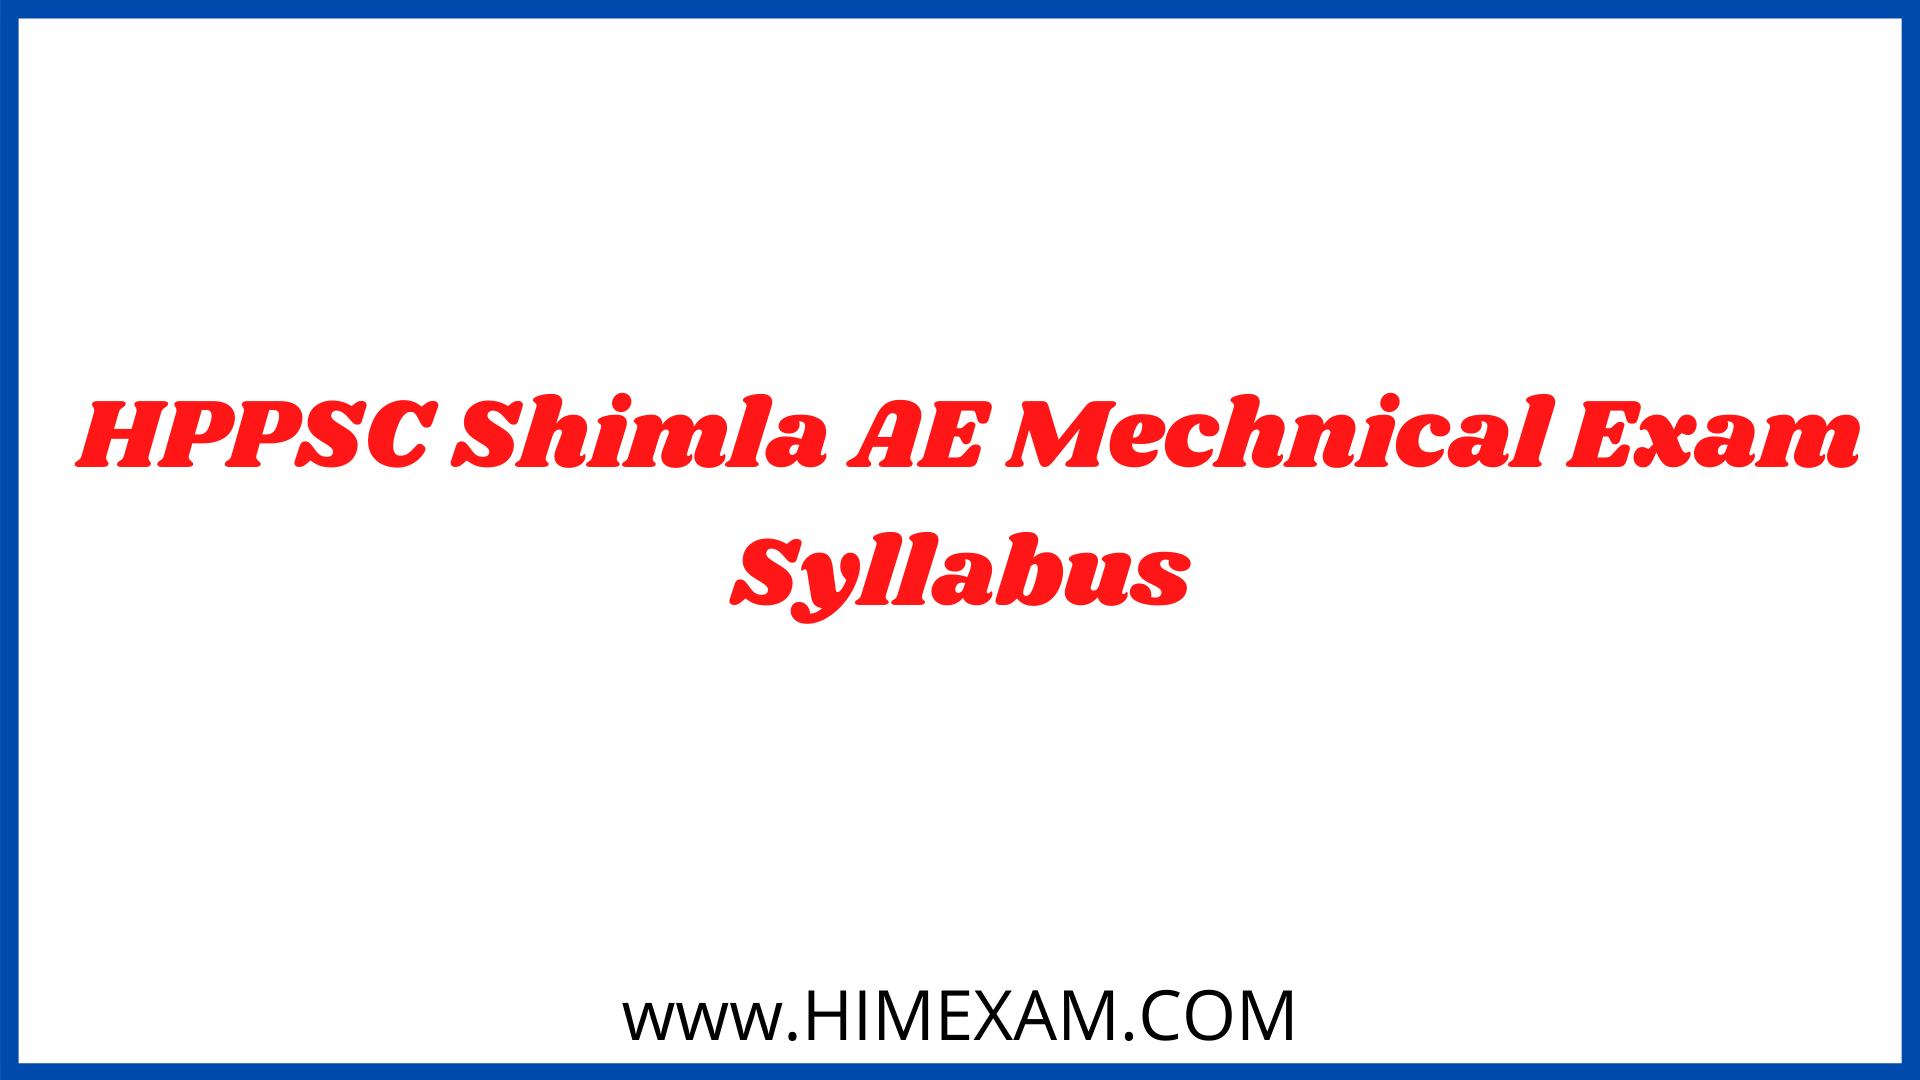 HPPSC Shimla AE Mechnical Exam Syllabus